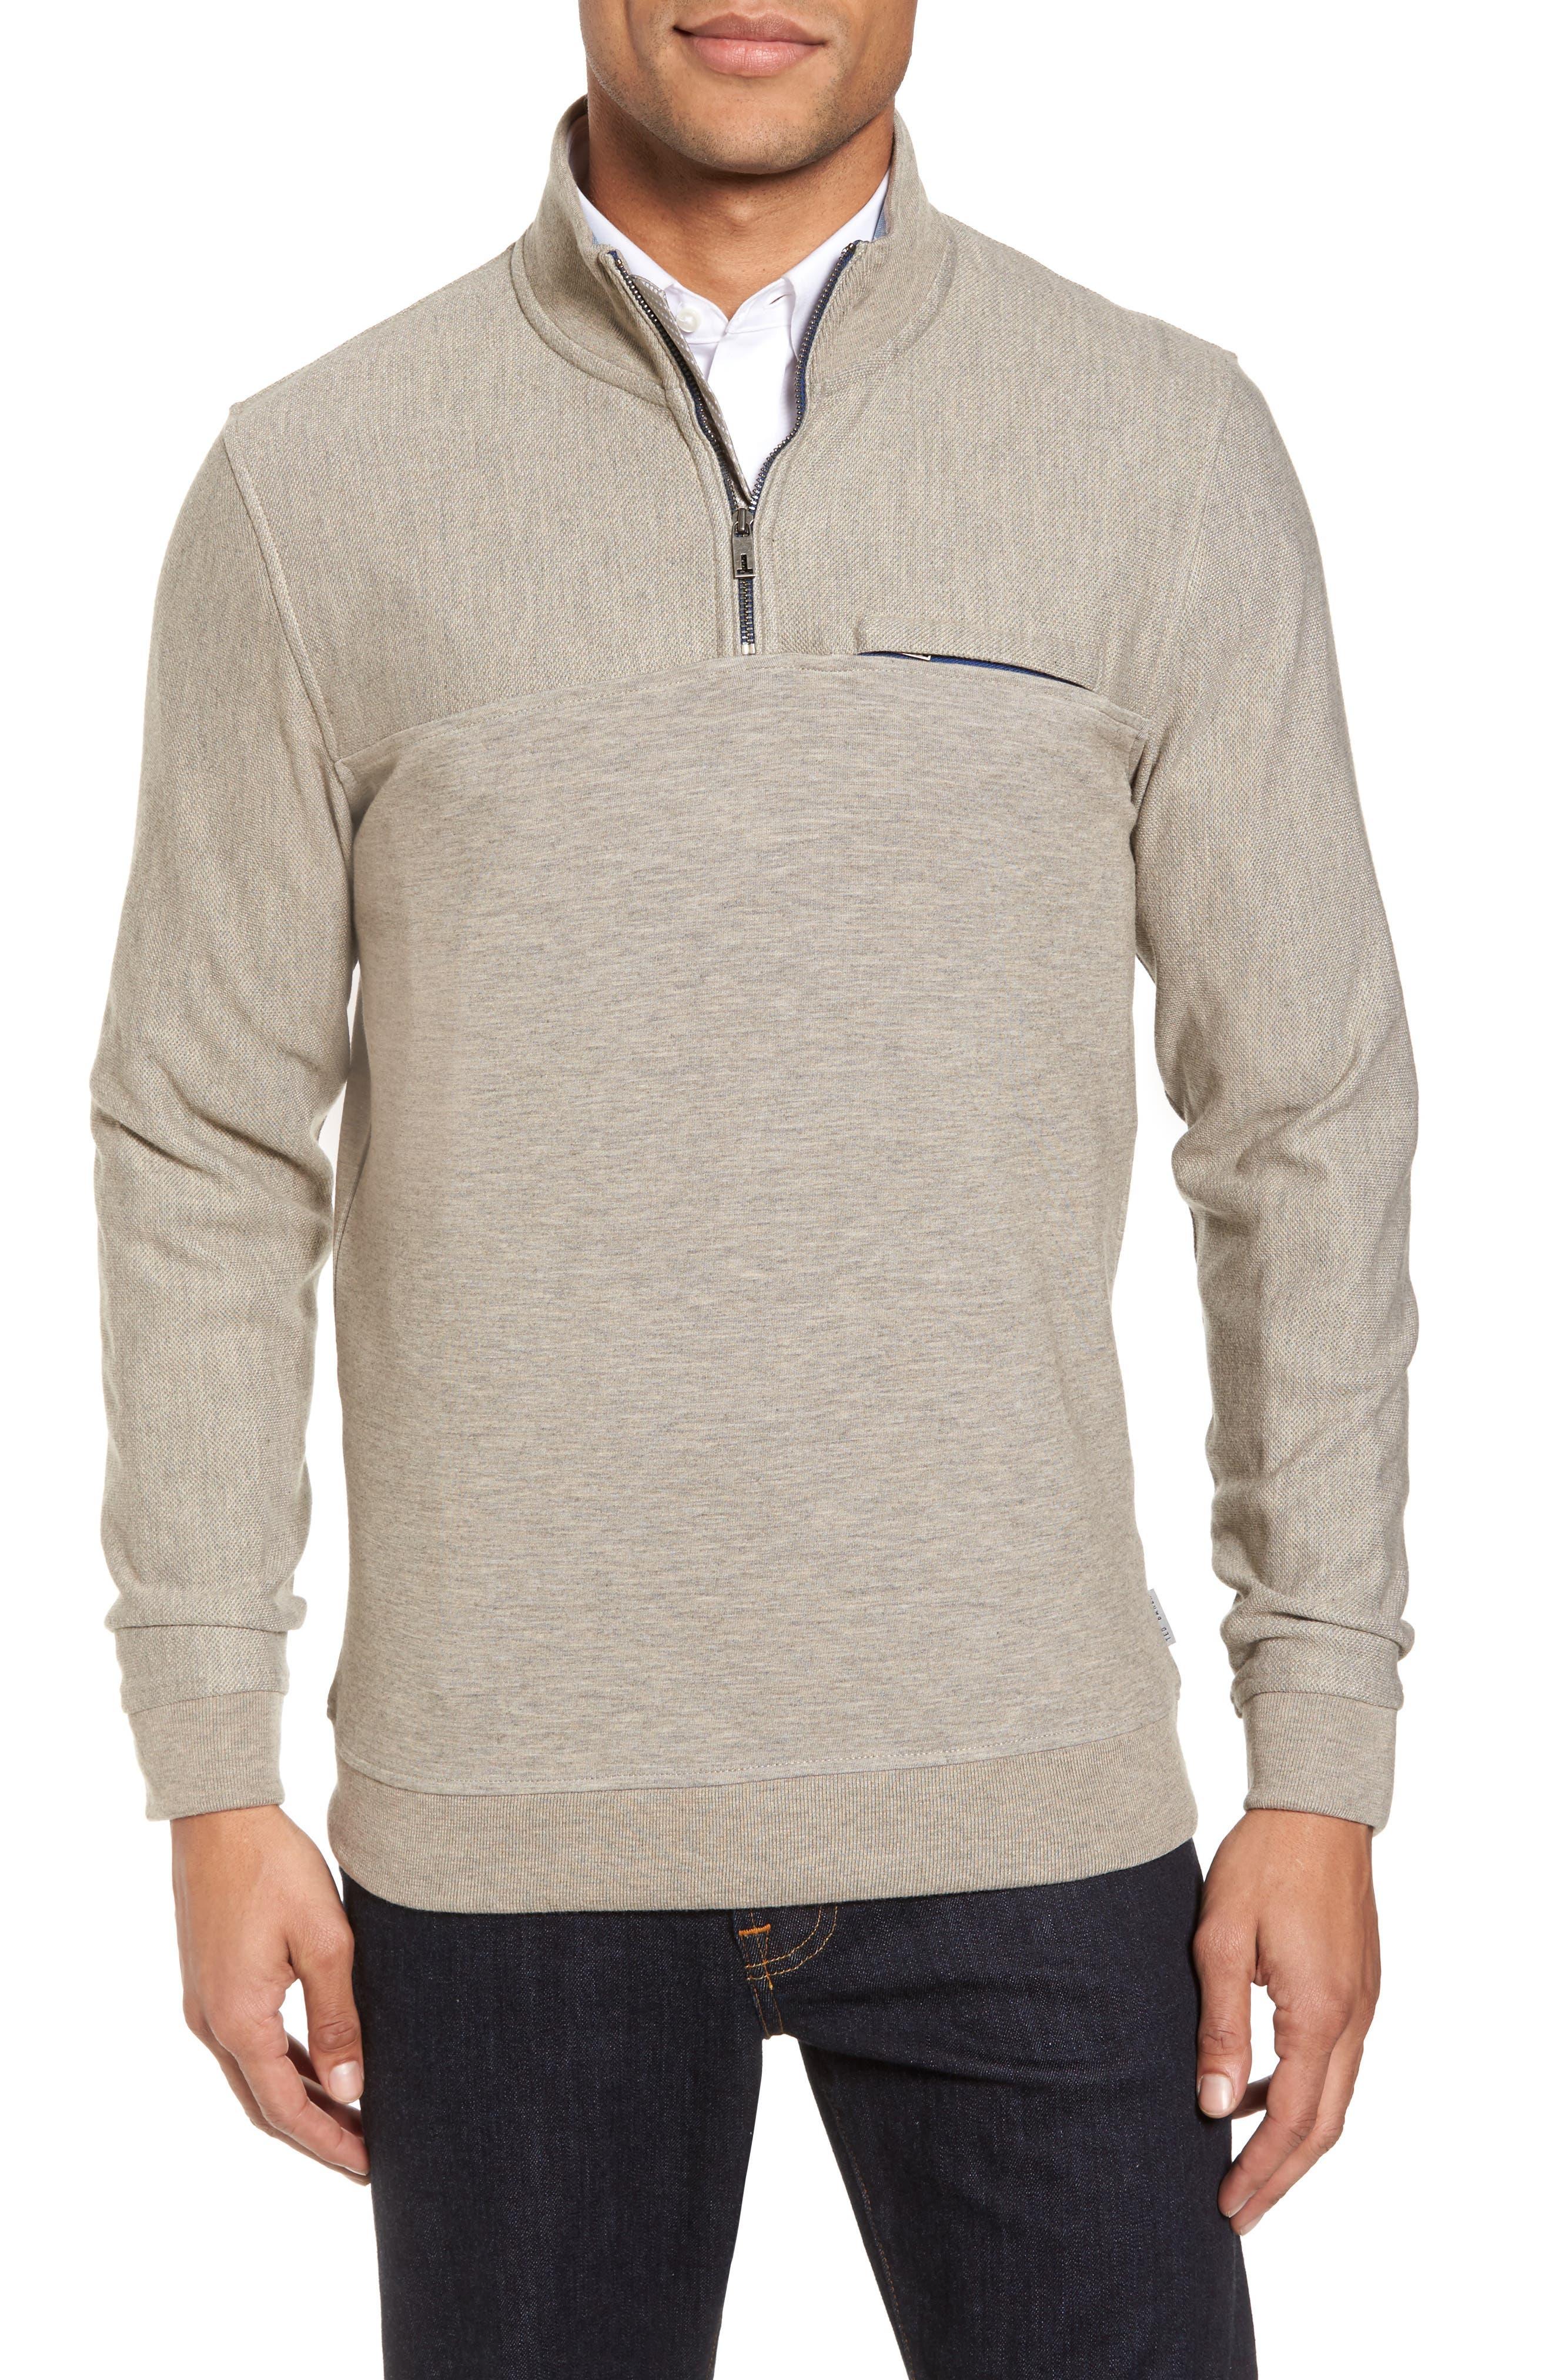 Alternate Image 1 Selected - Ted Baker London Livstay Slim Fit Quarter Zip Pullover